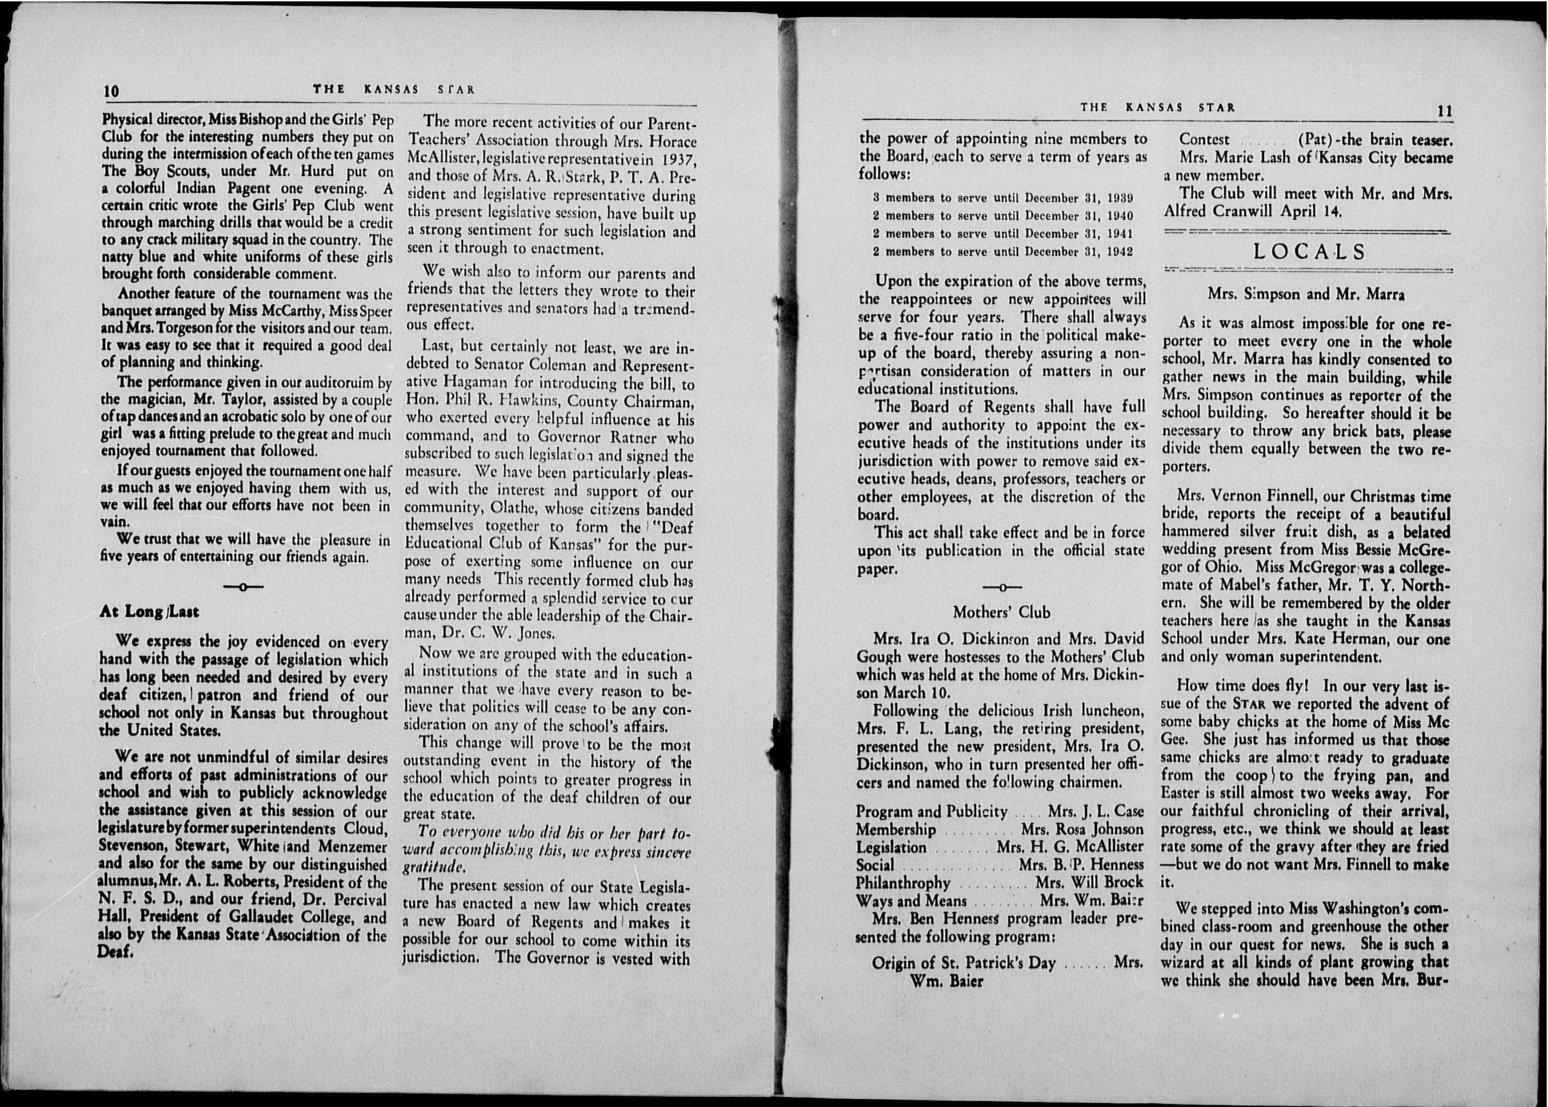 The Kansas Star, volume 52, number 6 - 10-11